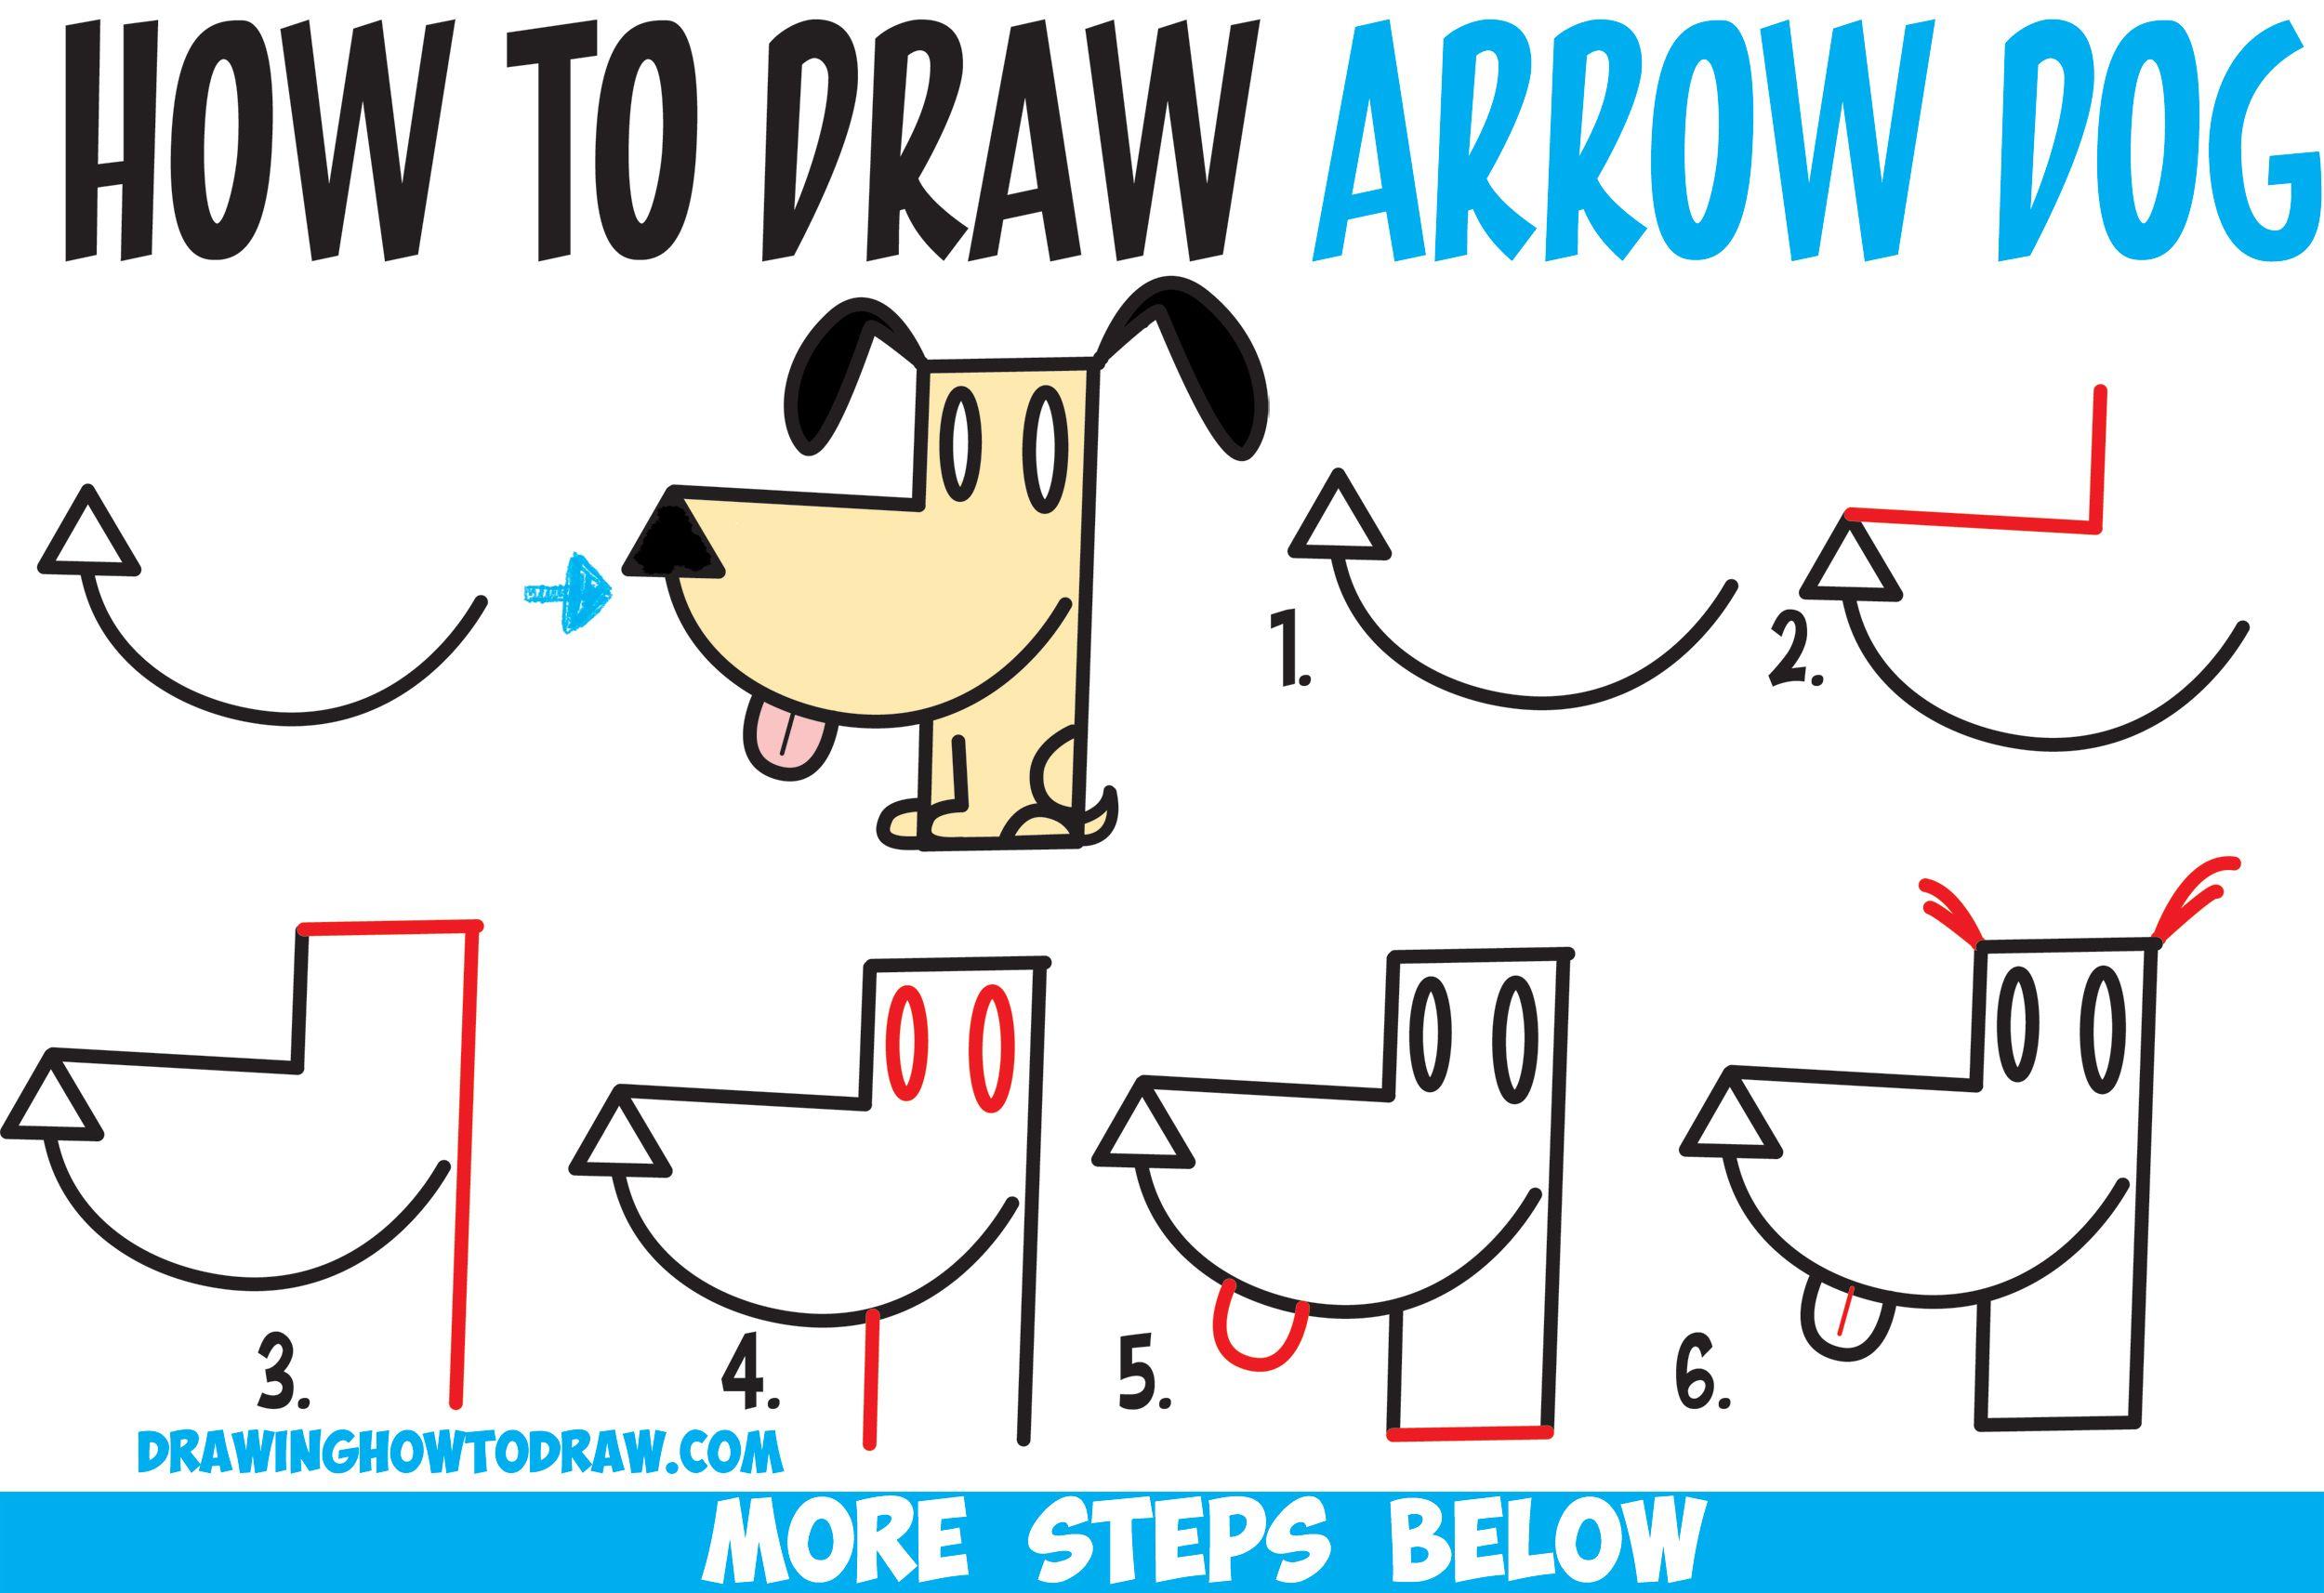 How to Draw a Cartoon Dog from an Arrow Shape - Easy Step ...